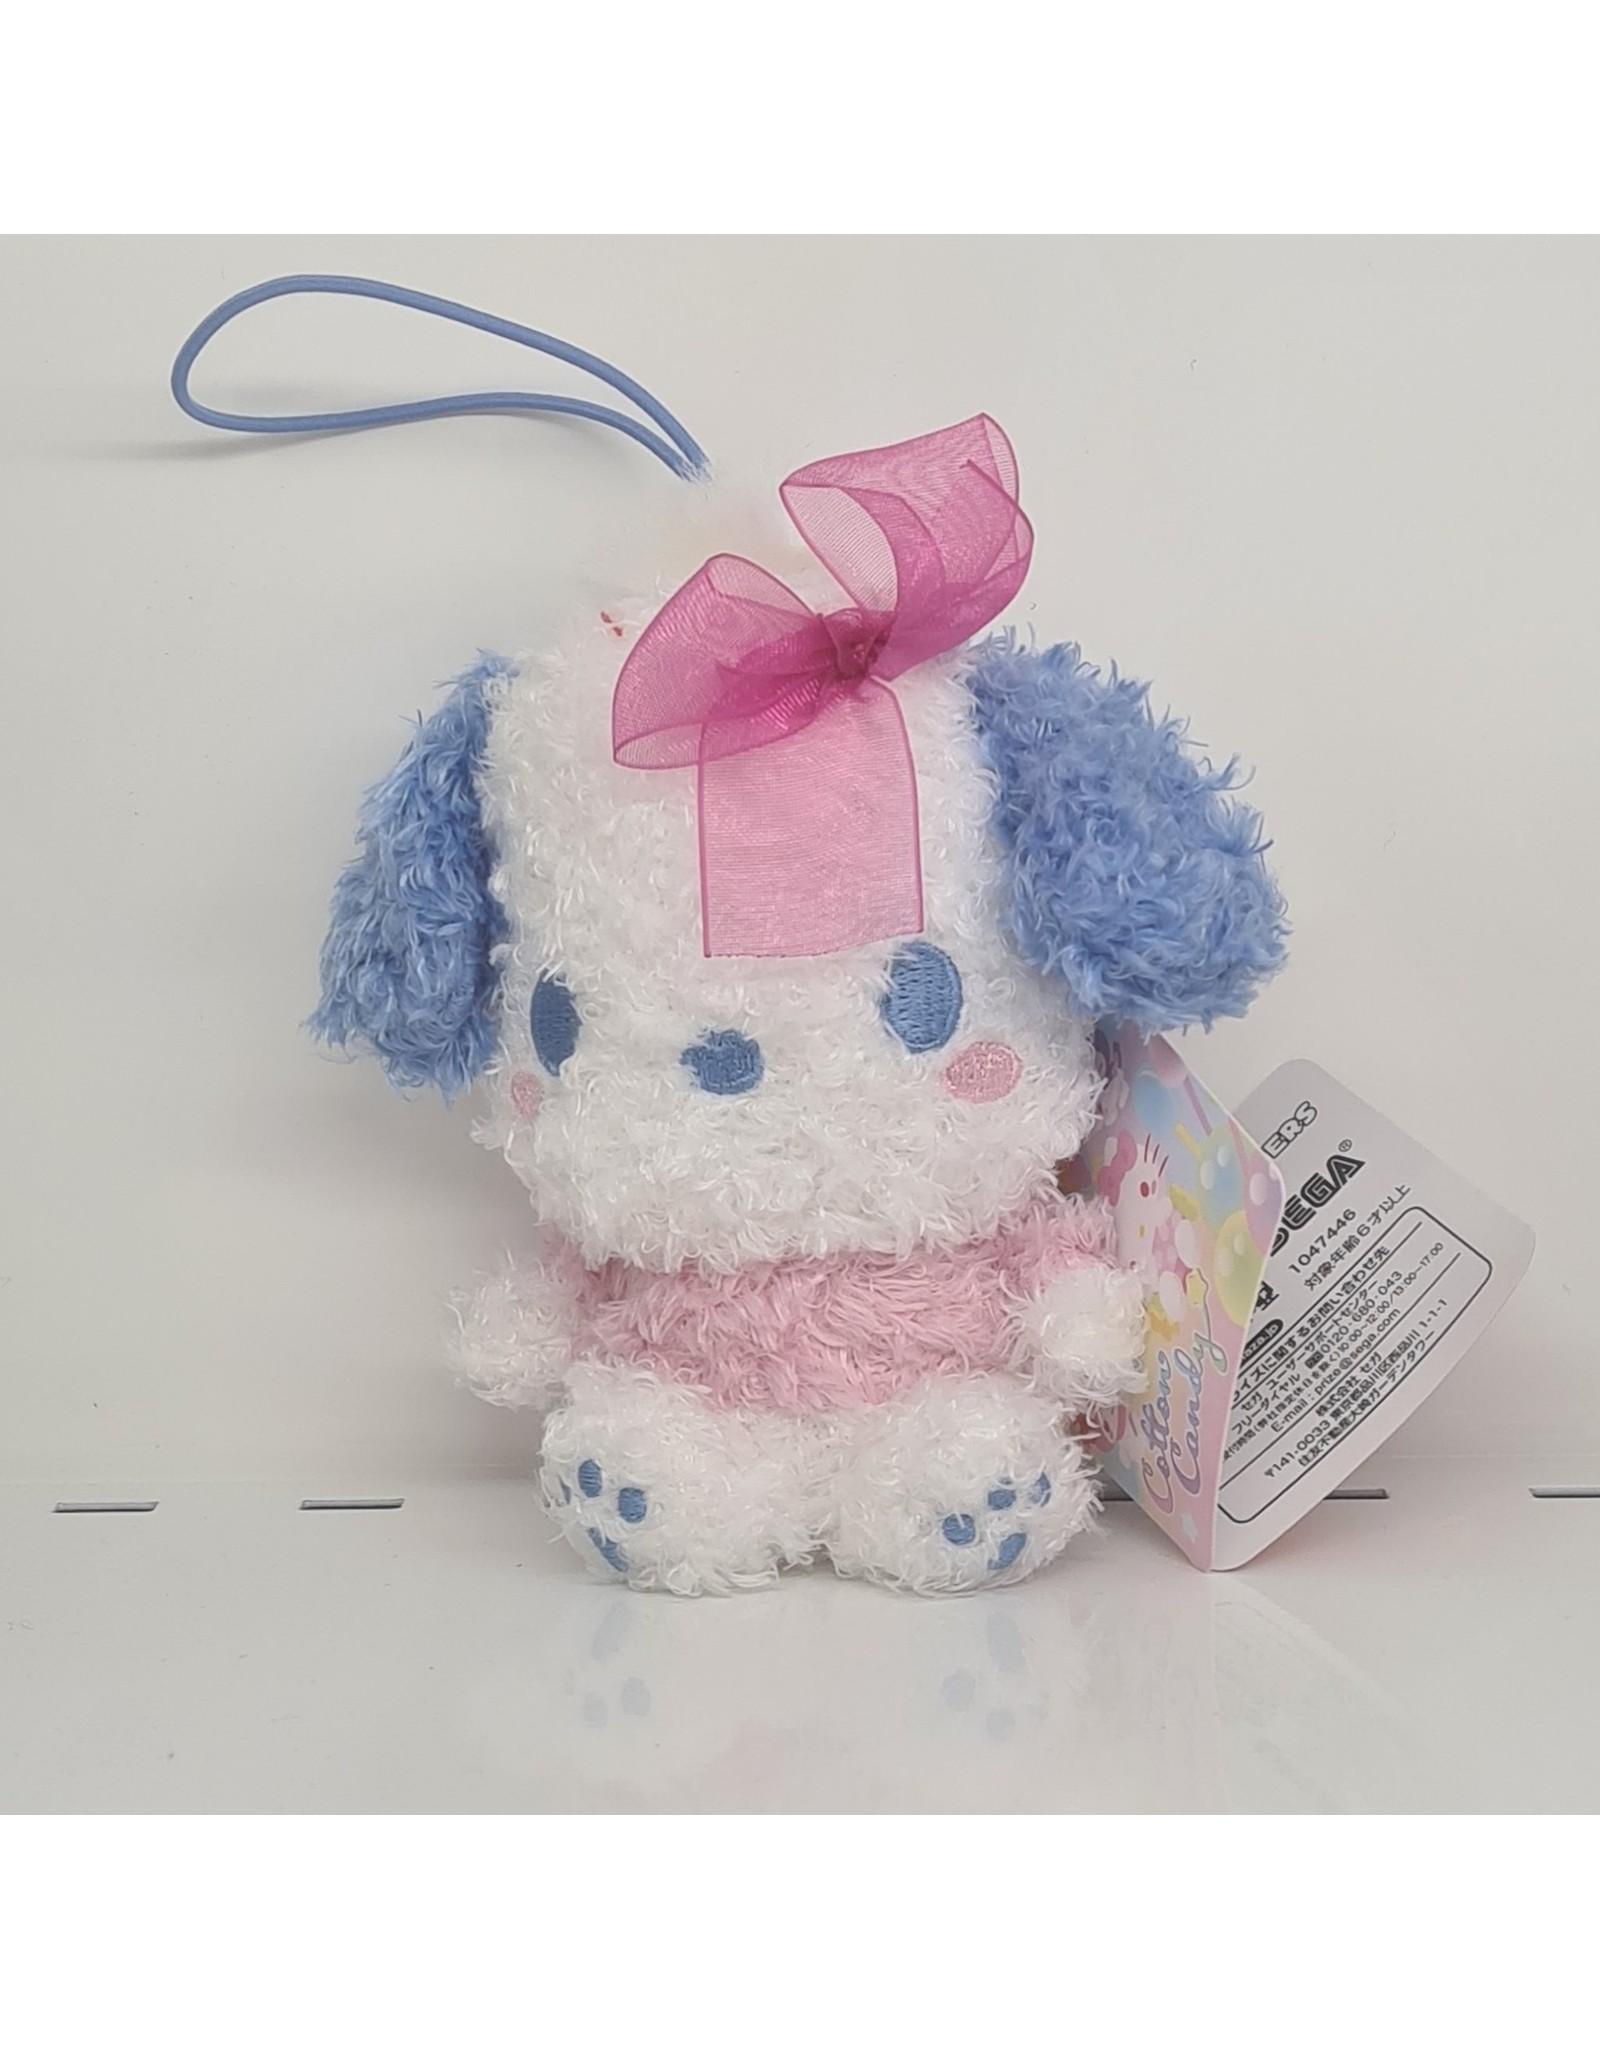 Sanrio Cotton Candy Ribbon Plush - Pochacco - 10 cm